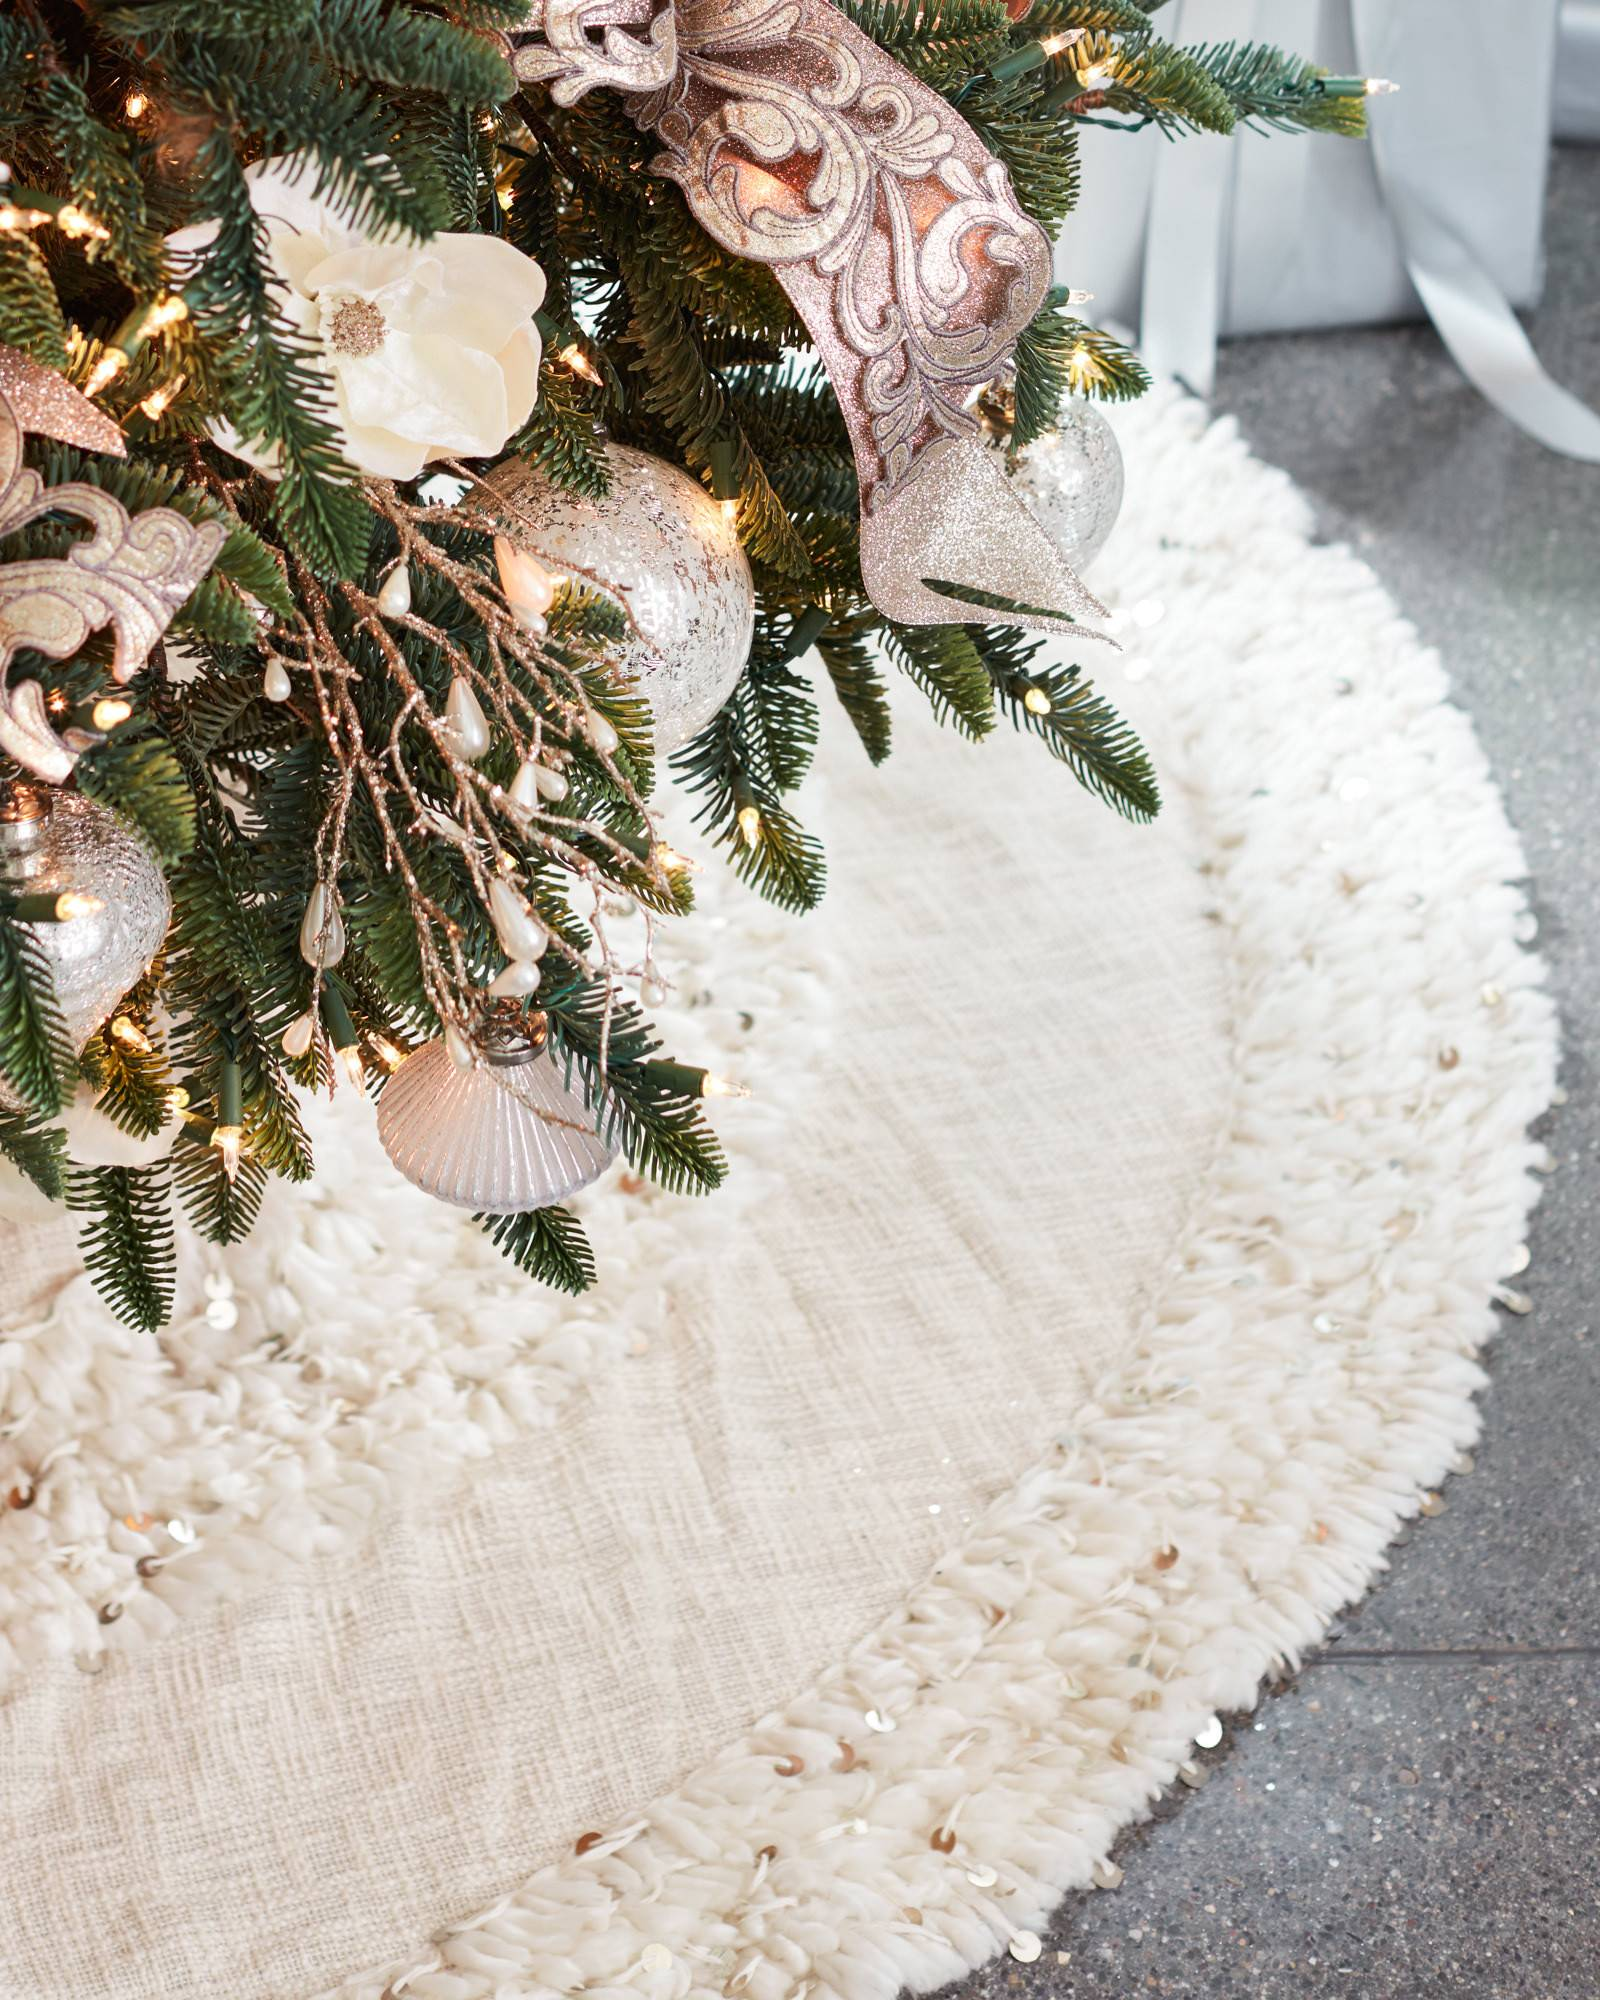 Juliette Artisan Christmas Tree Skirt | Balsam Hill UK